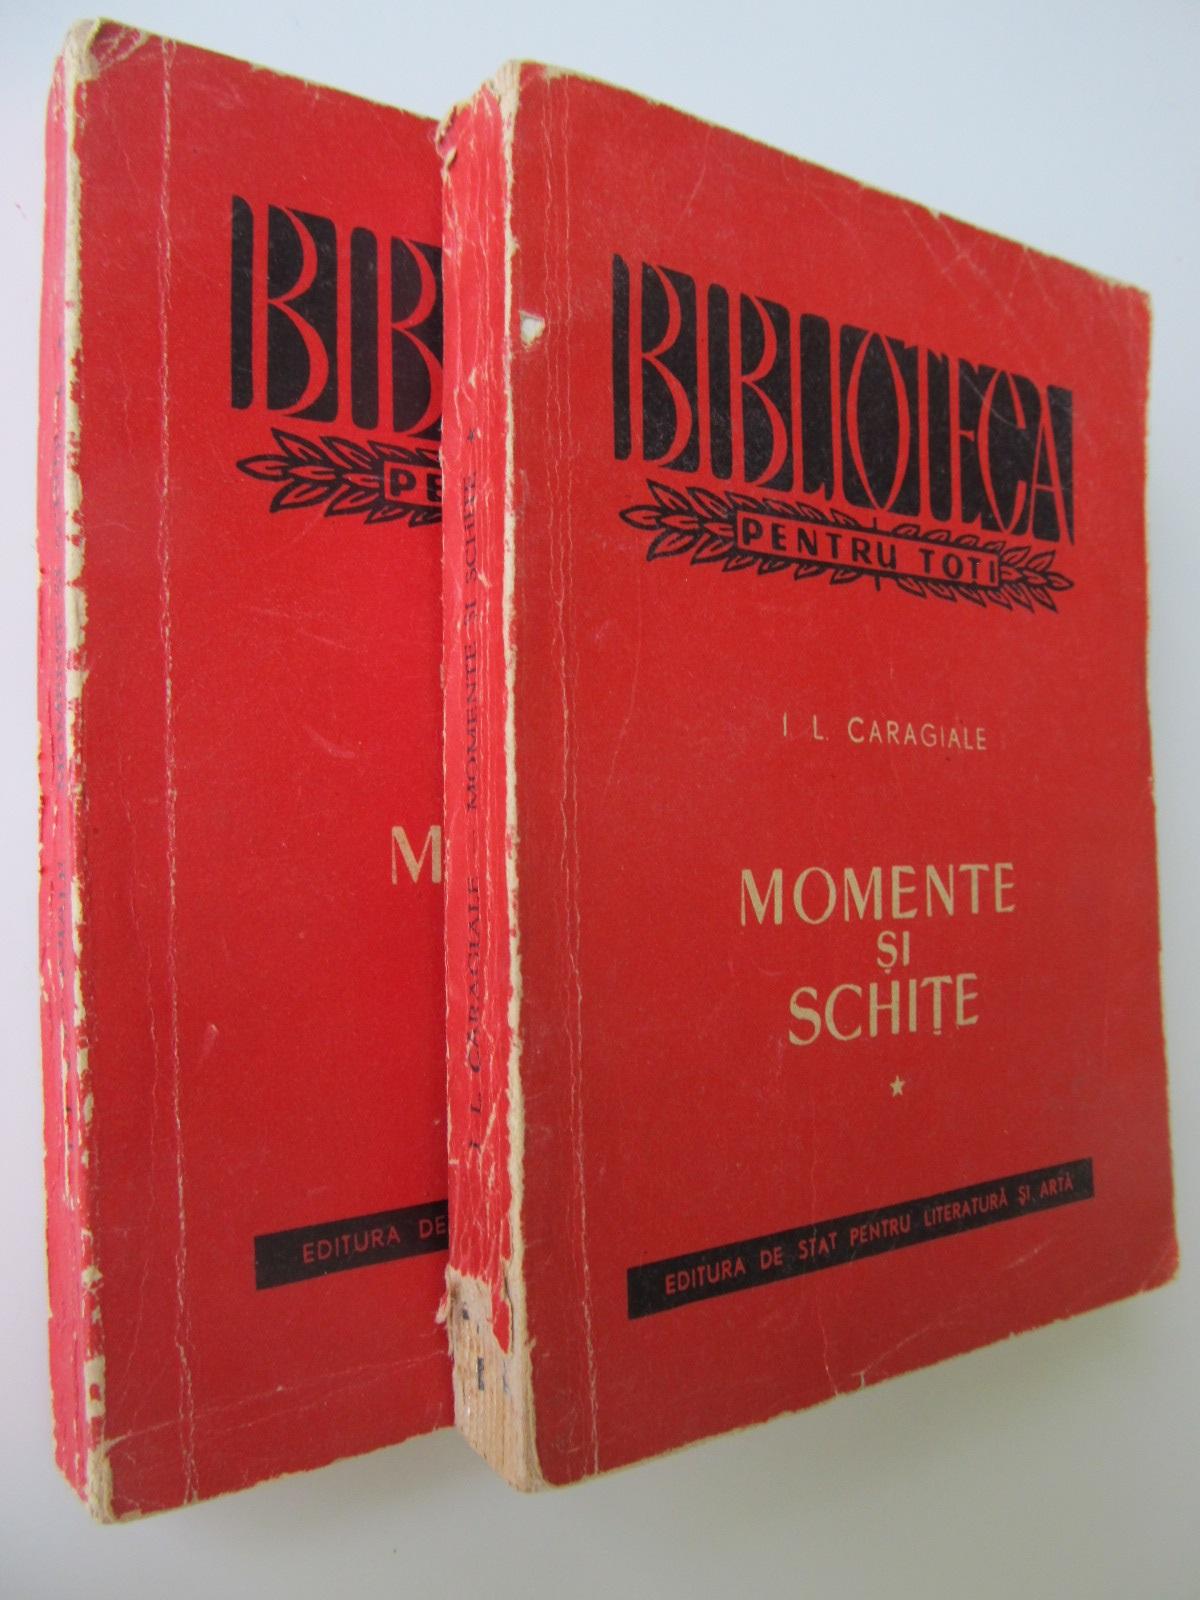 Momente si schite (2 vol.) - I. L. Caragiale | Detalii carte